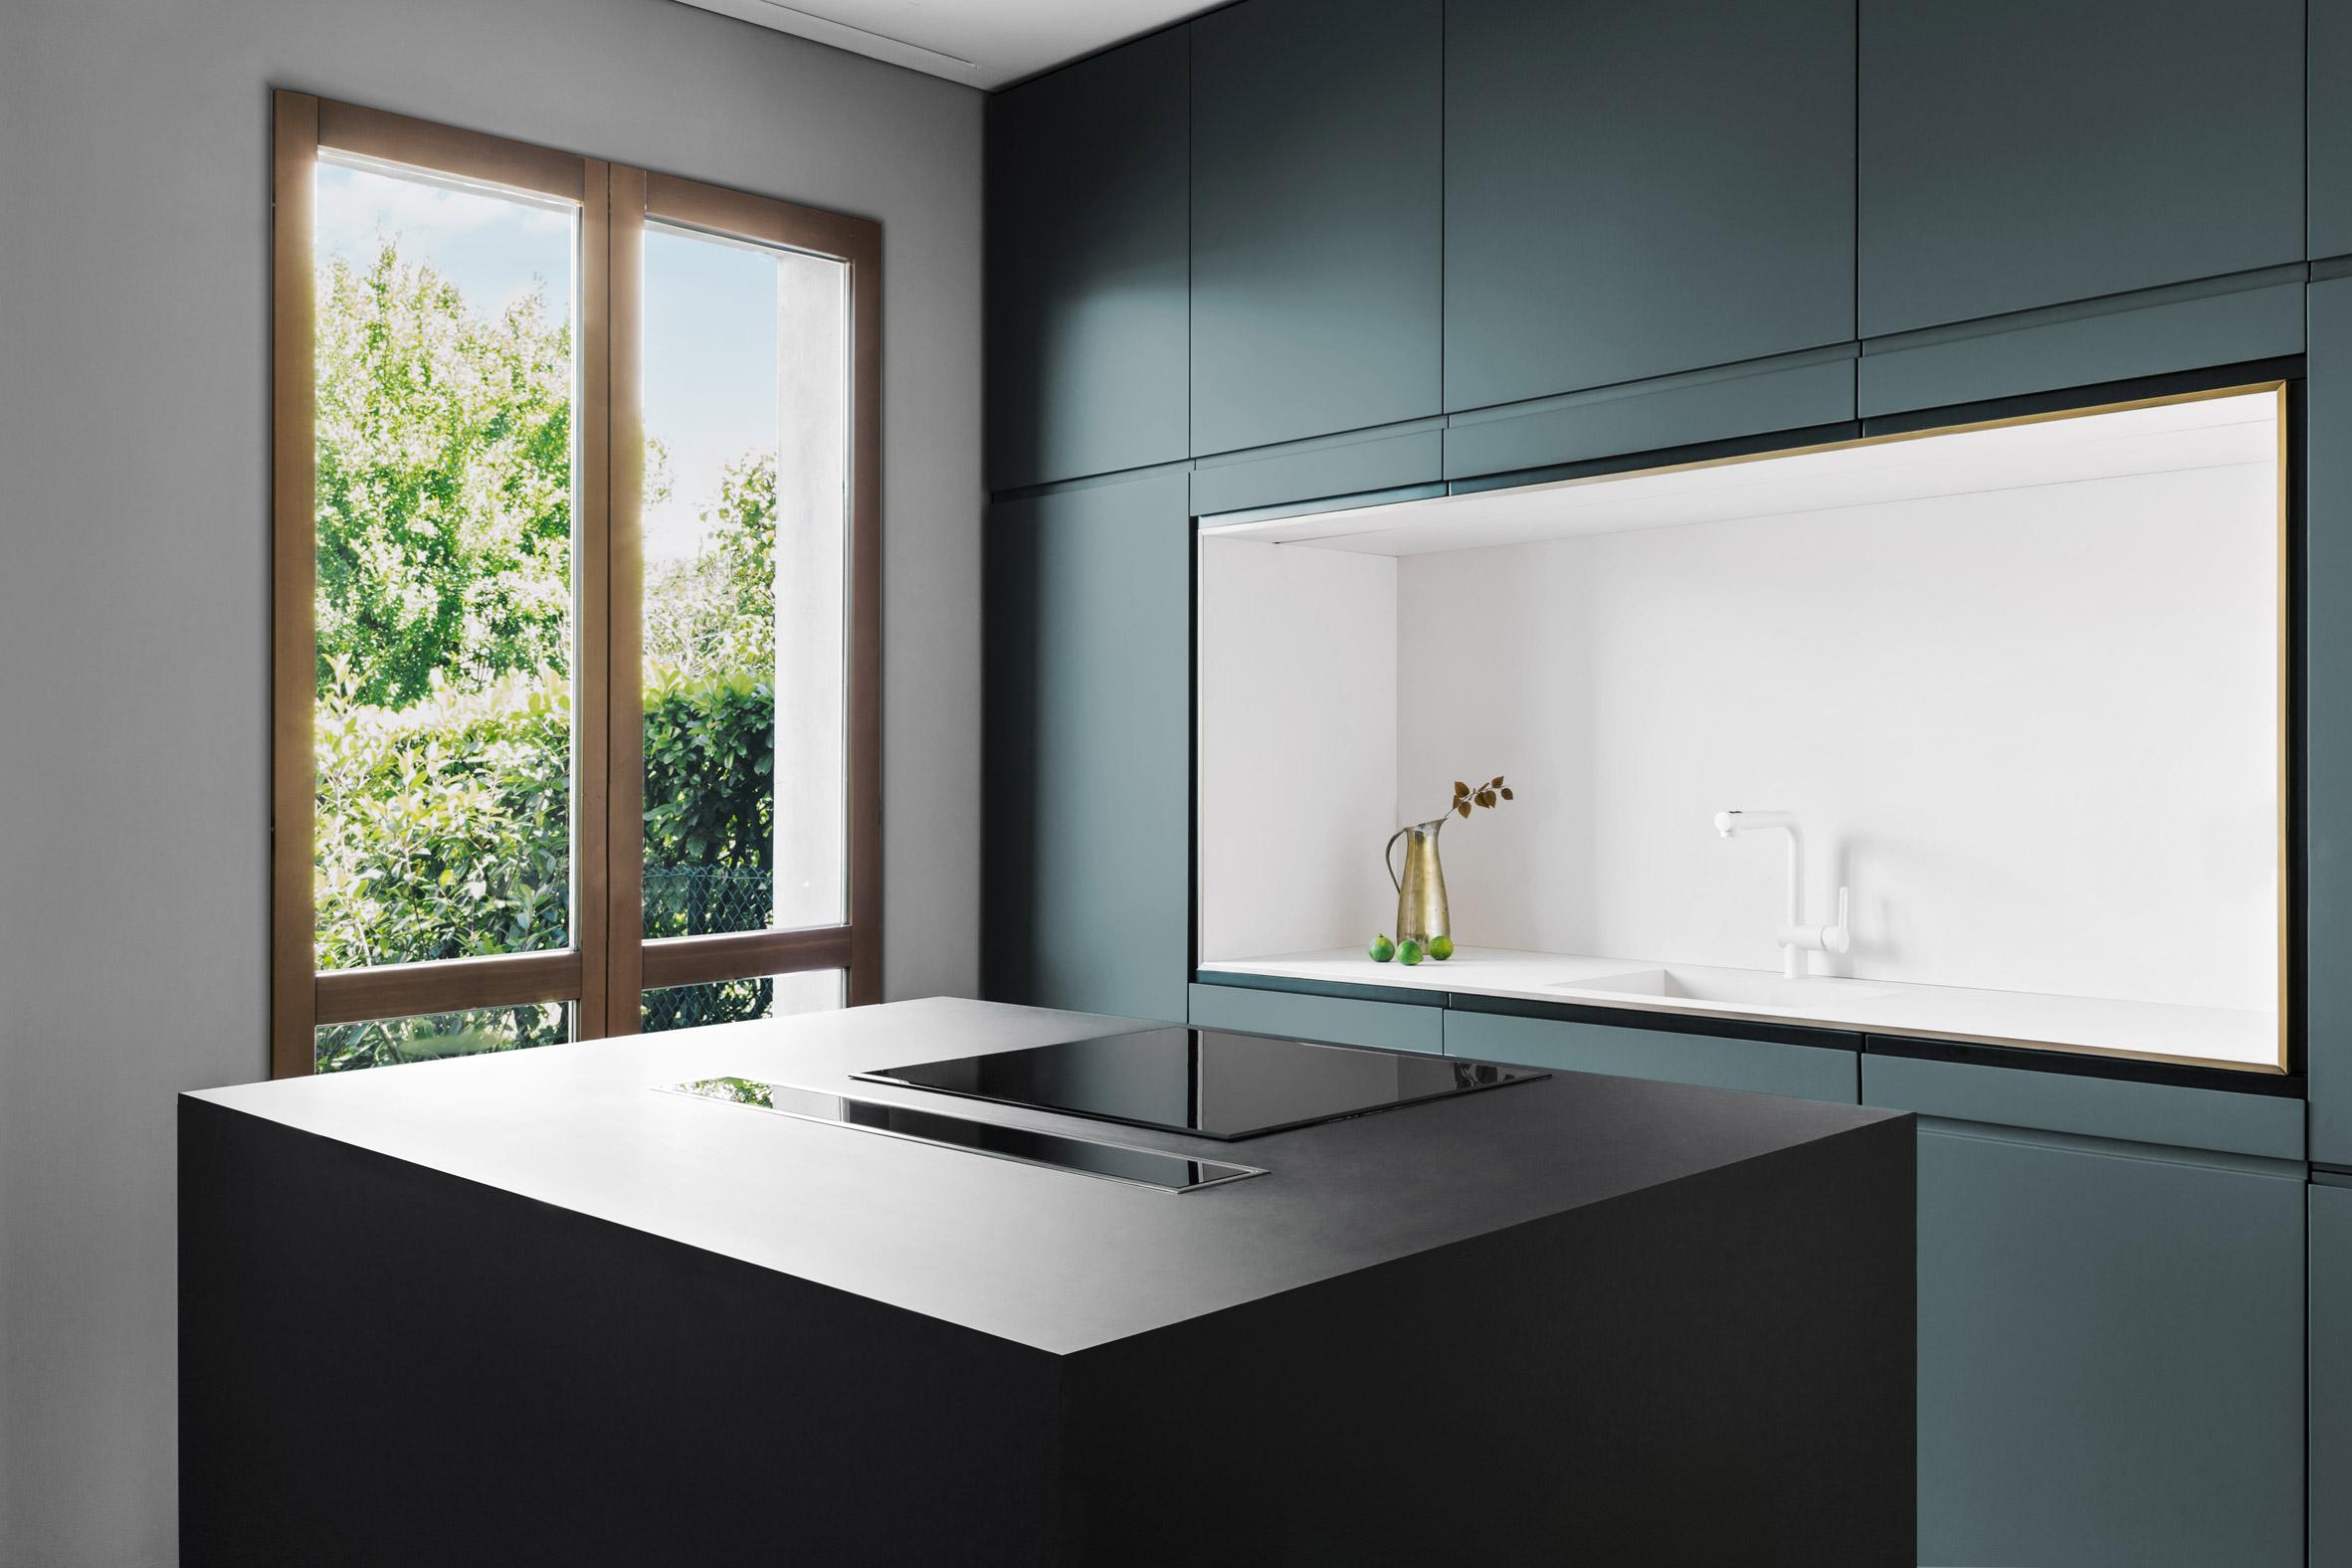 architecture-house-residential-design-studia-interiors-osnovadesign-osnova-poltava_03